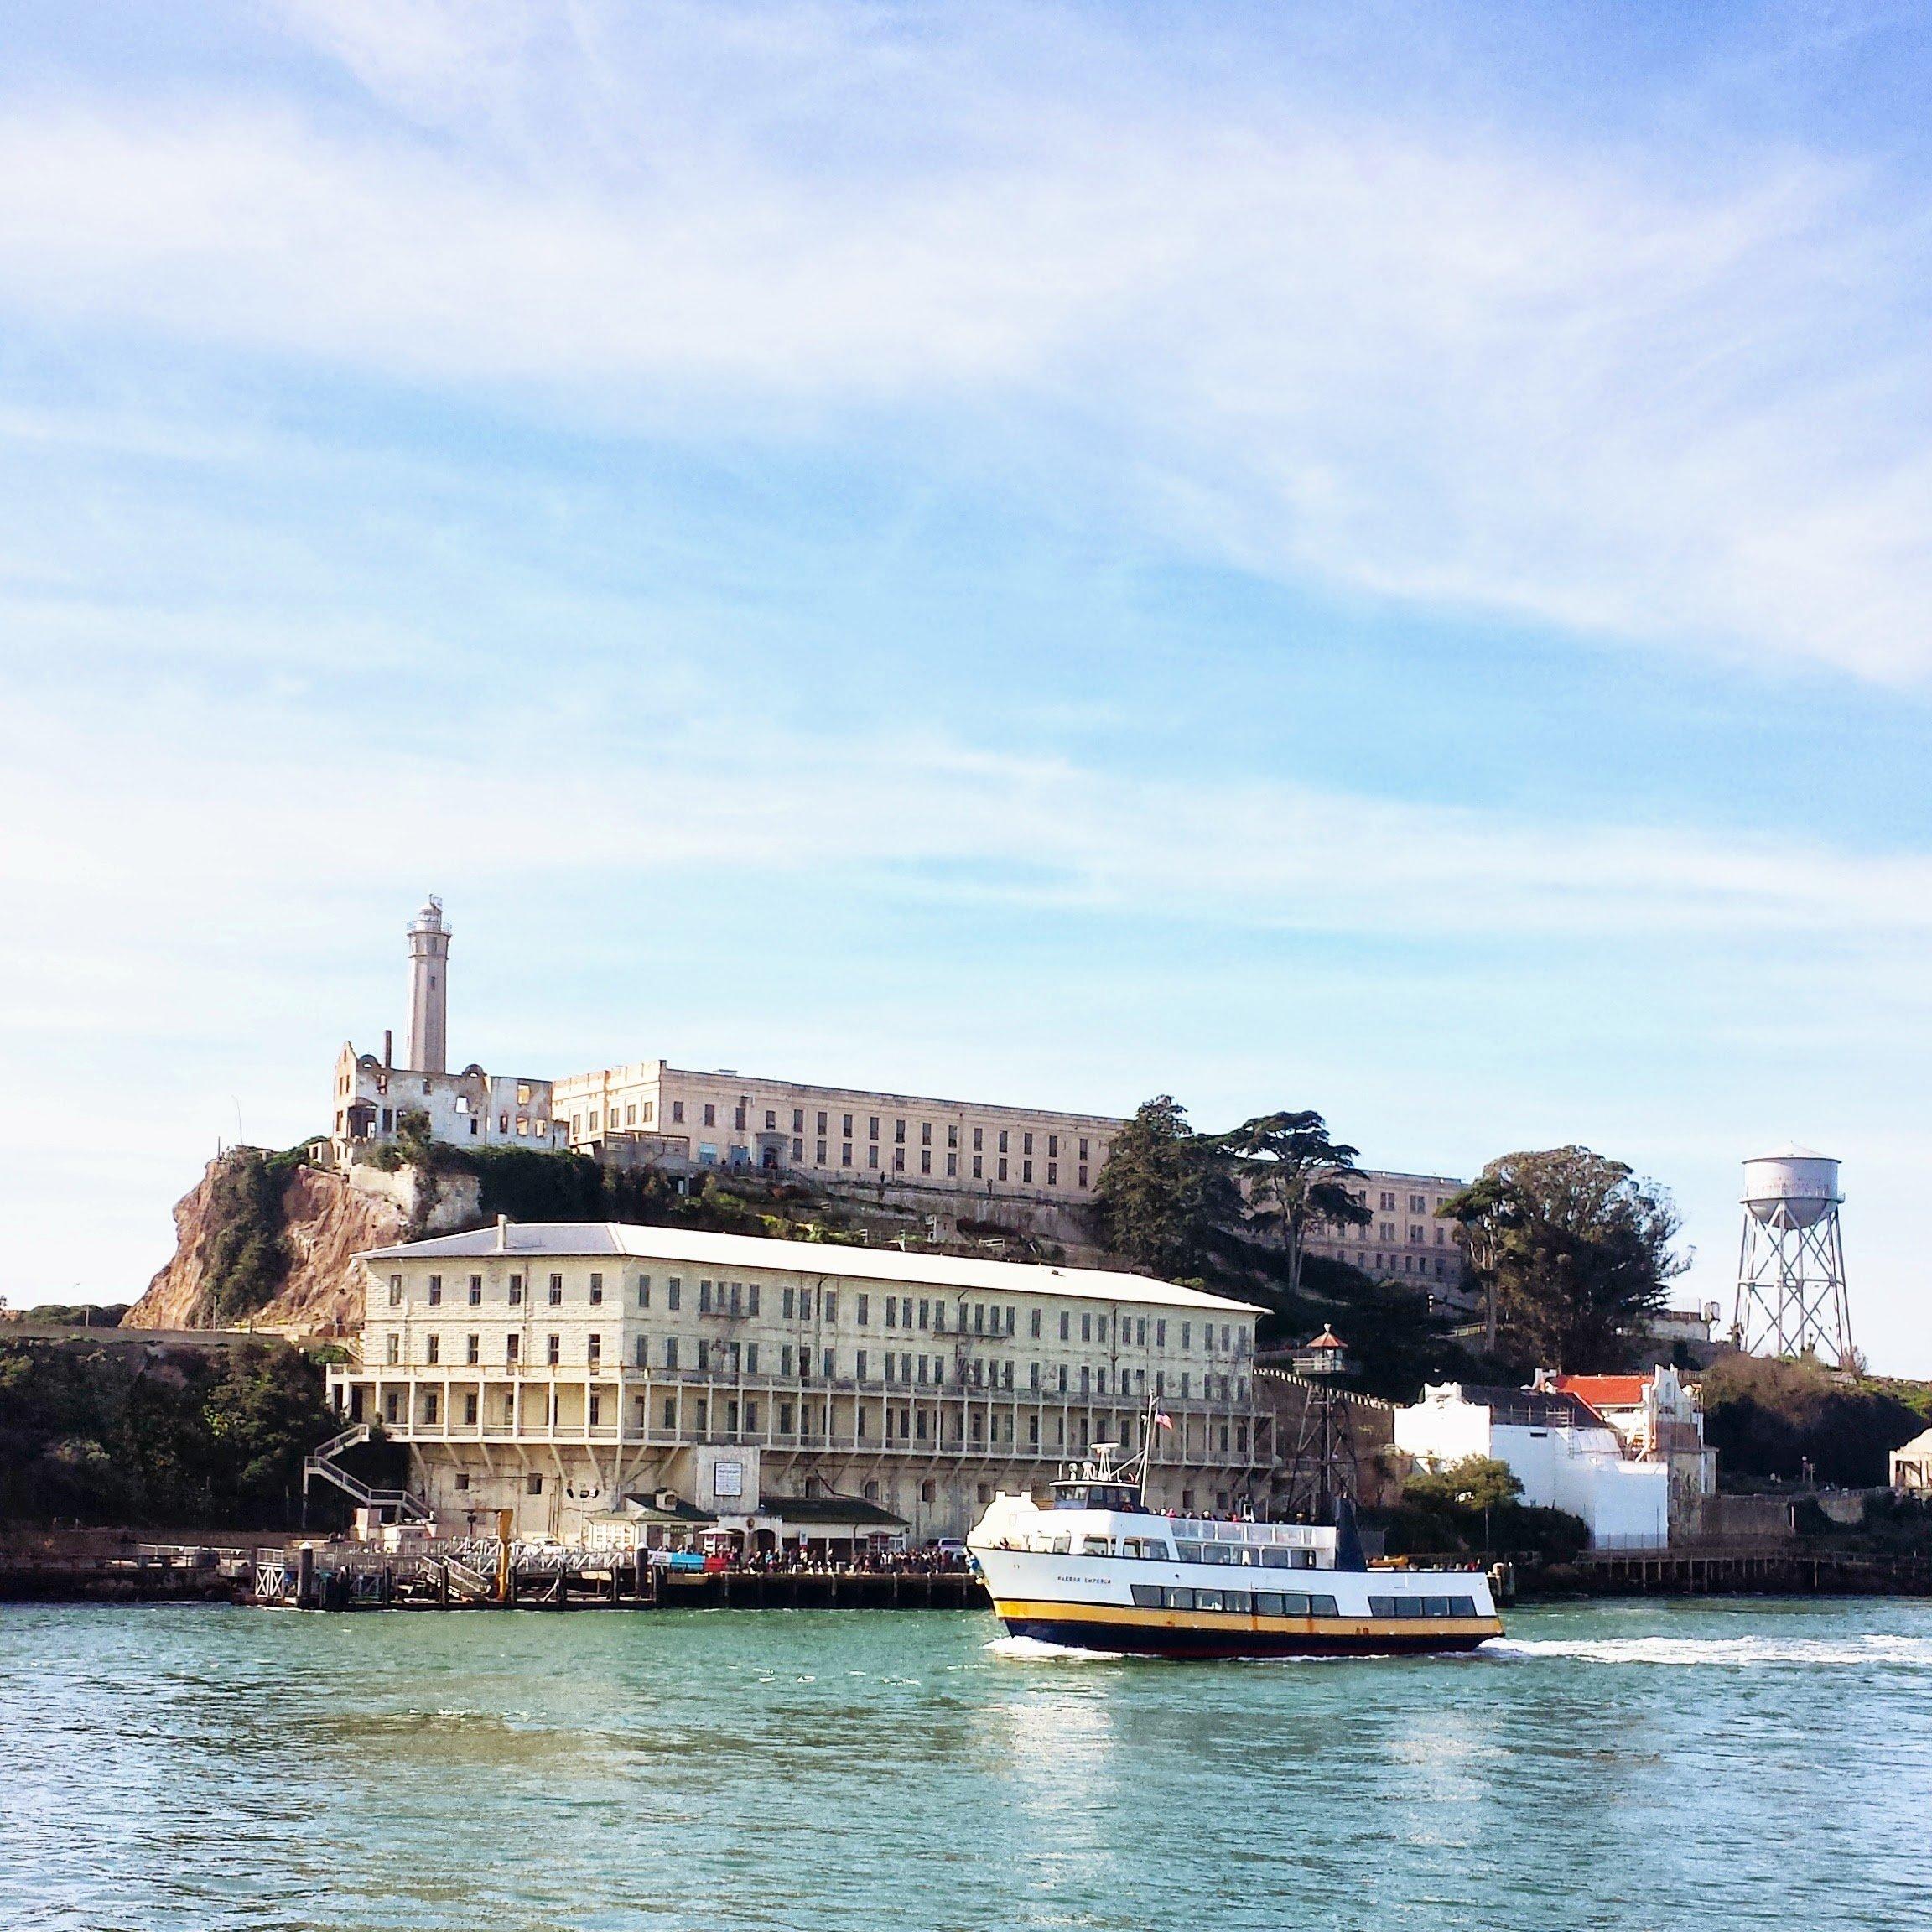 Ai Weiwei's @Large Exhibit, Alcatraz Island, San Francisco - Sabrina Brett - 19